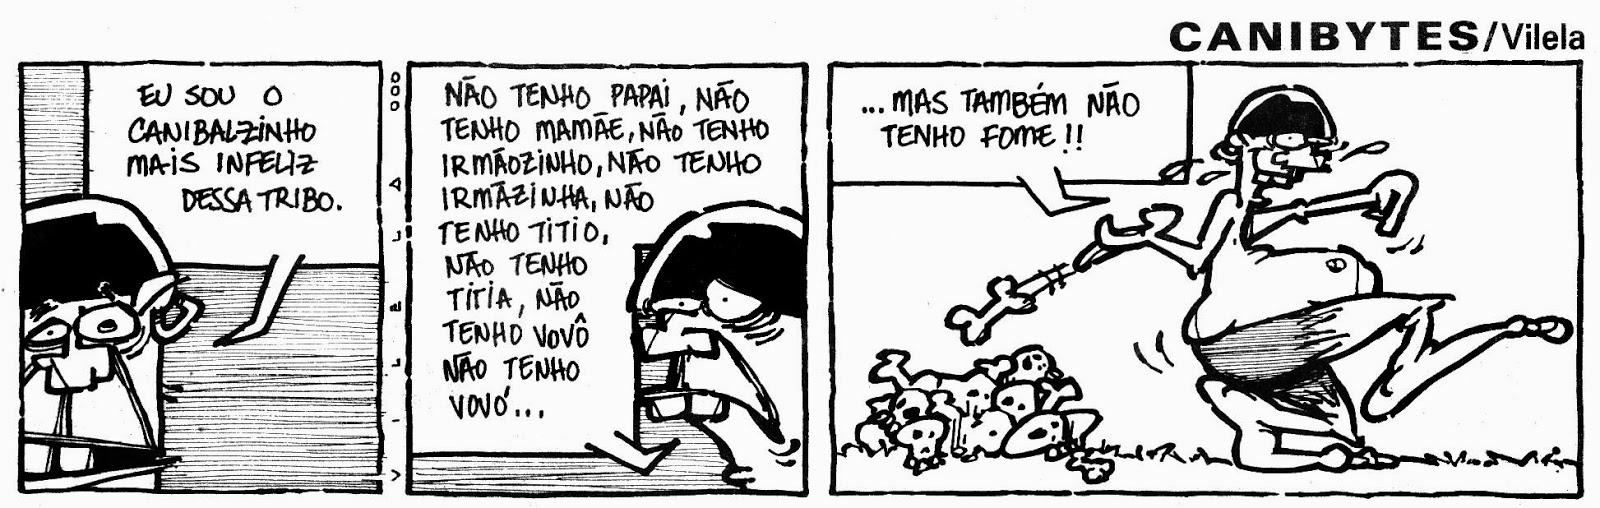 Canibytes (1992)